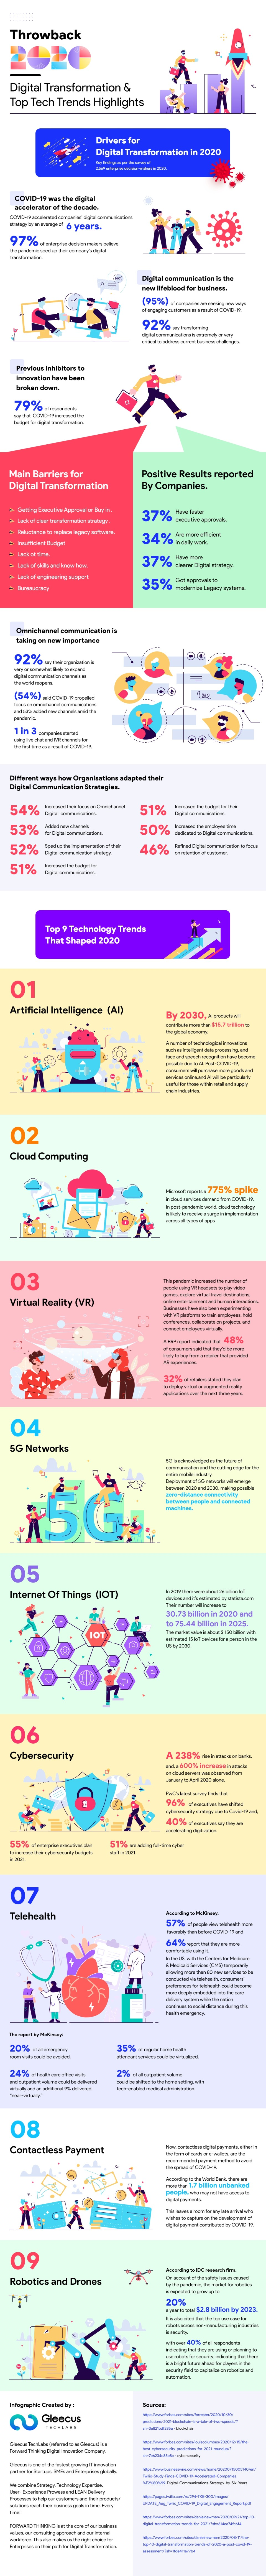 Throwback 2020 - Digital Transformation & Tech Trends